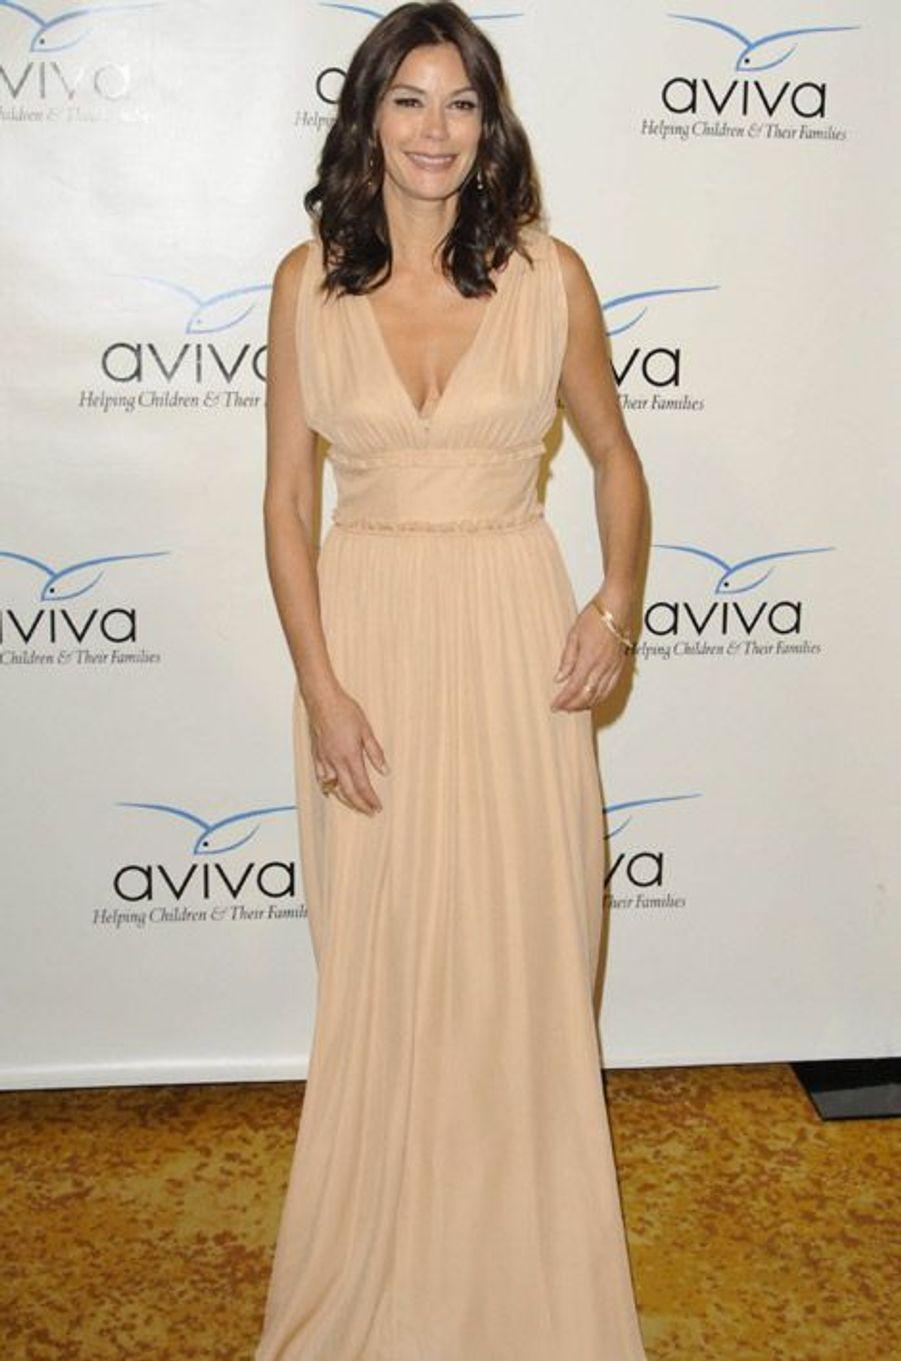 L'actrice américaine Teri Hatcher (Desperate Housewives)